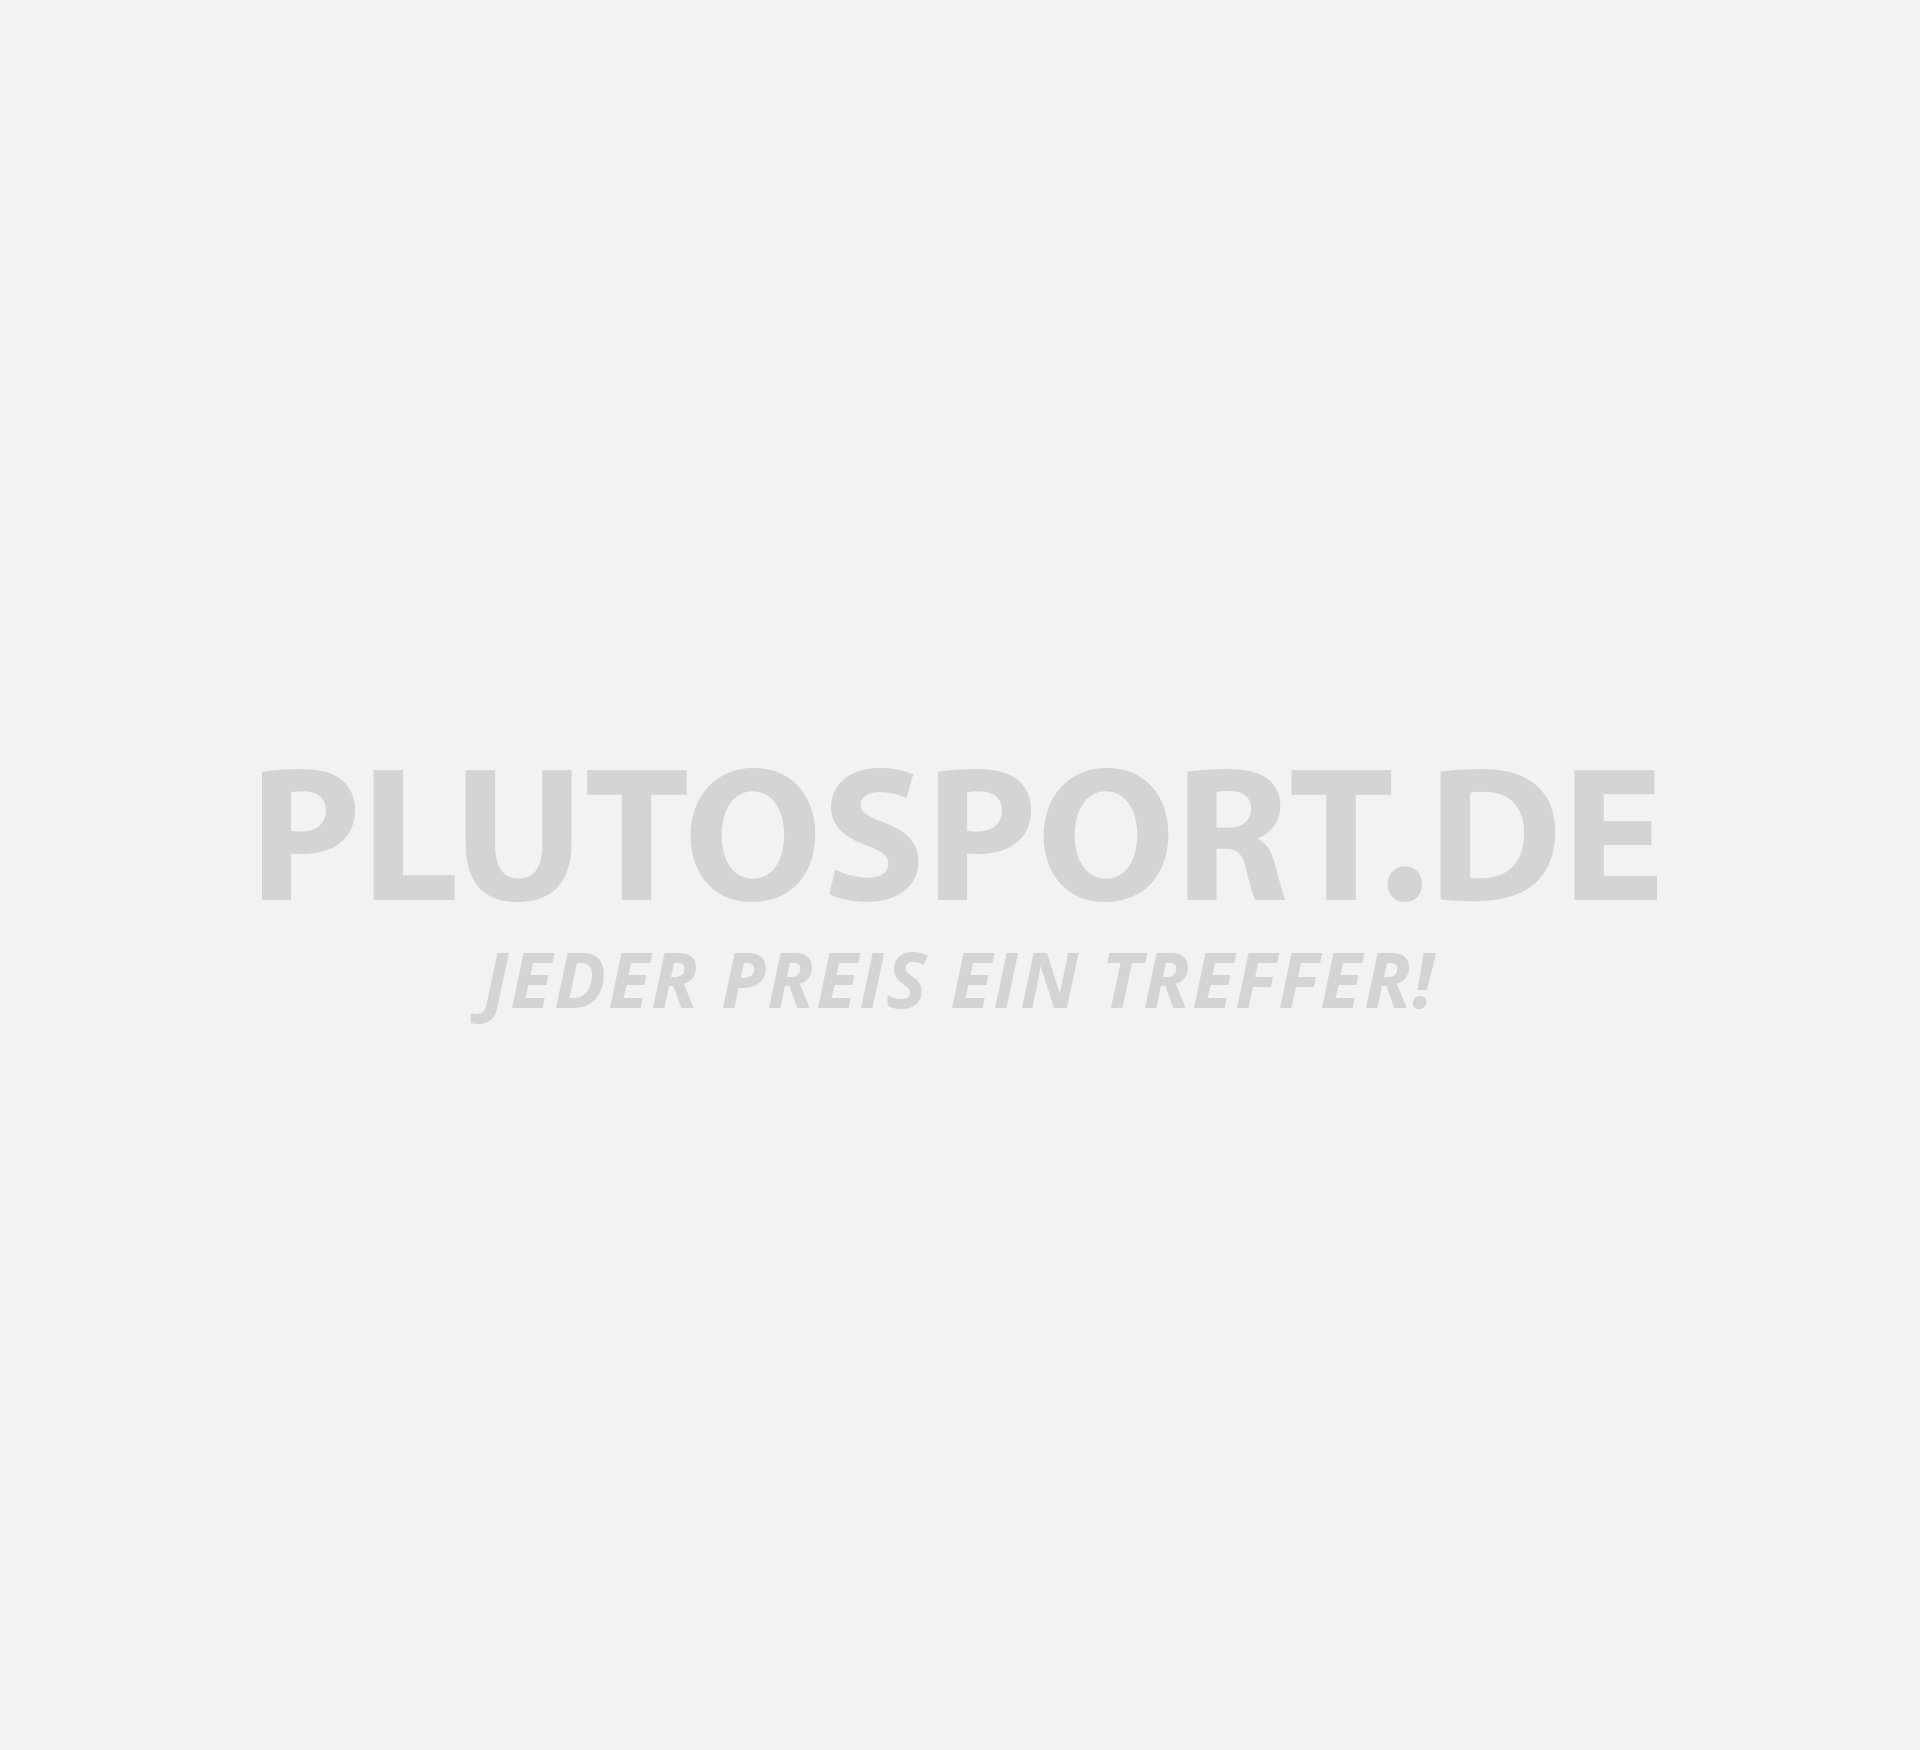 Nike Air Max 90 Grey in Damen Turnschuhe & Sneakers günstig